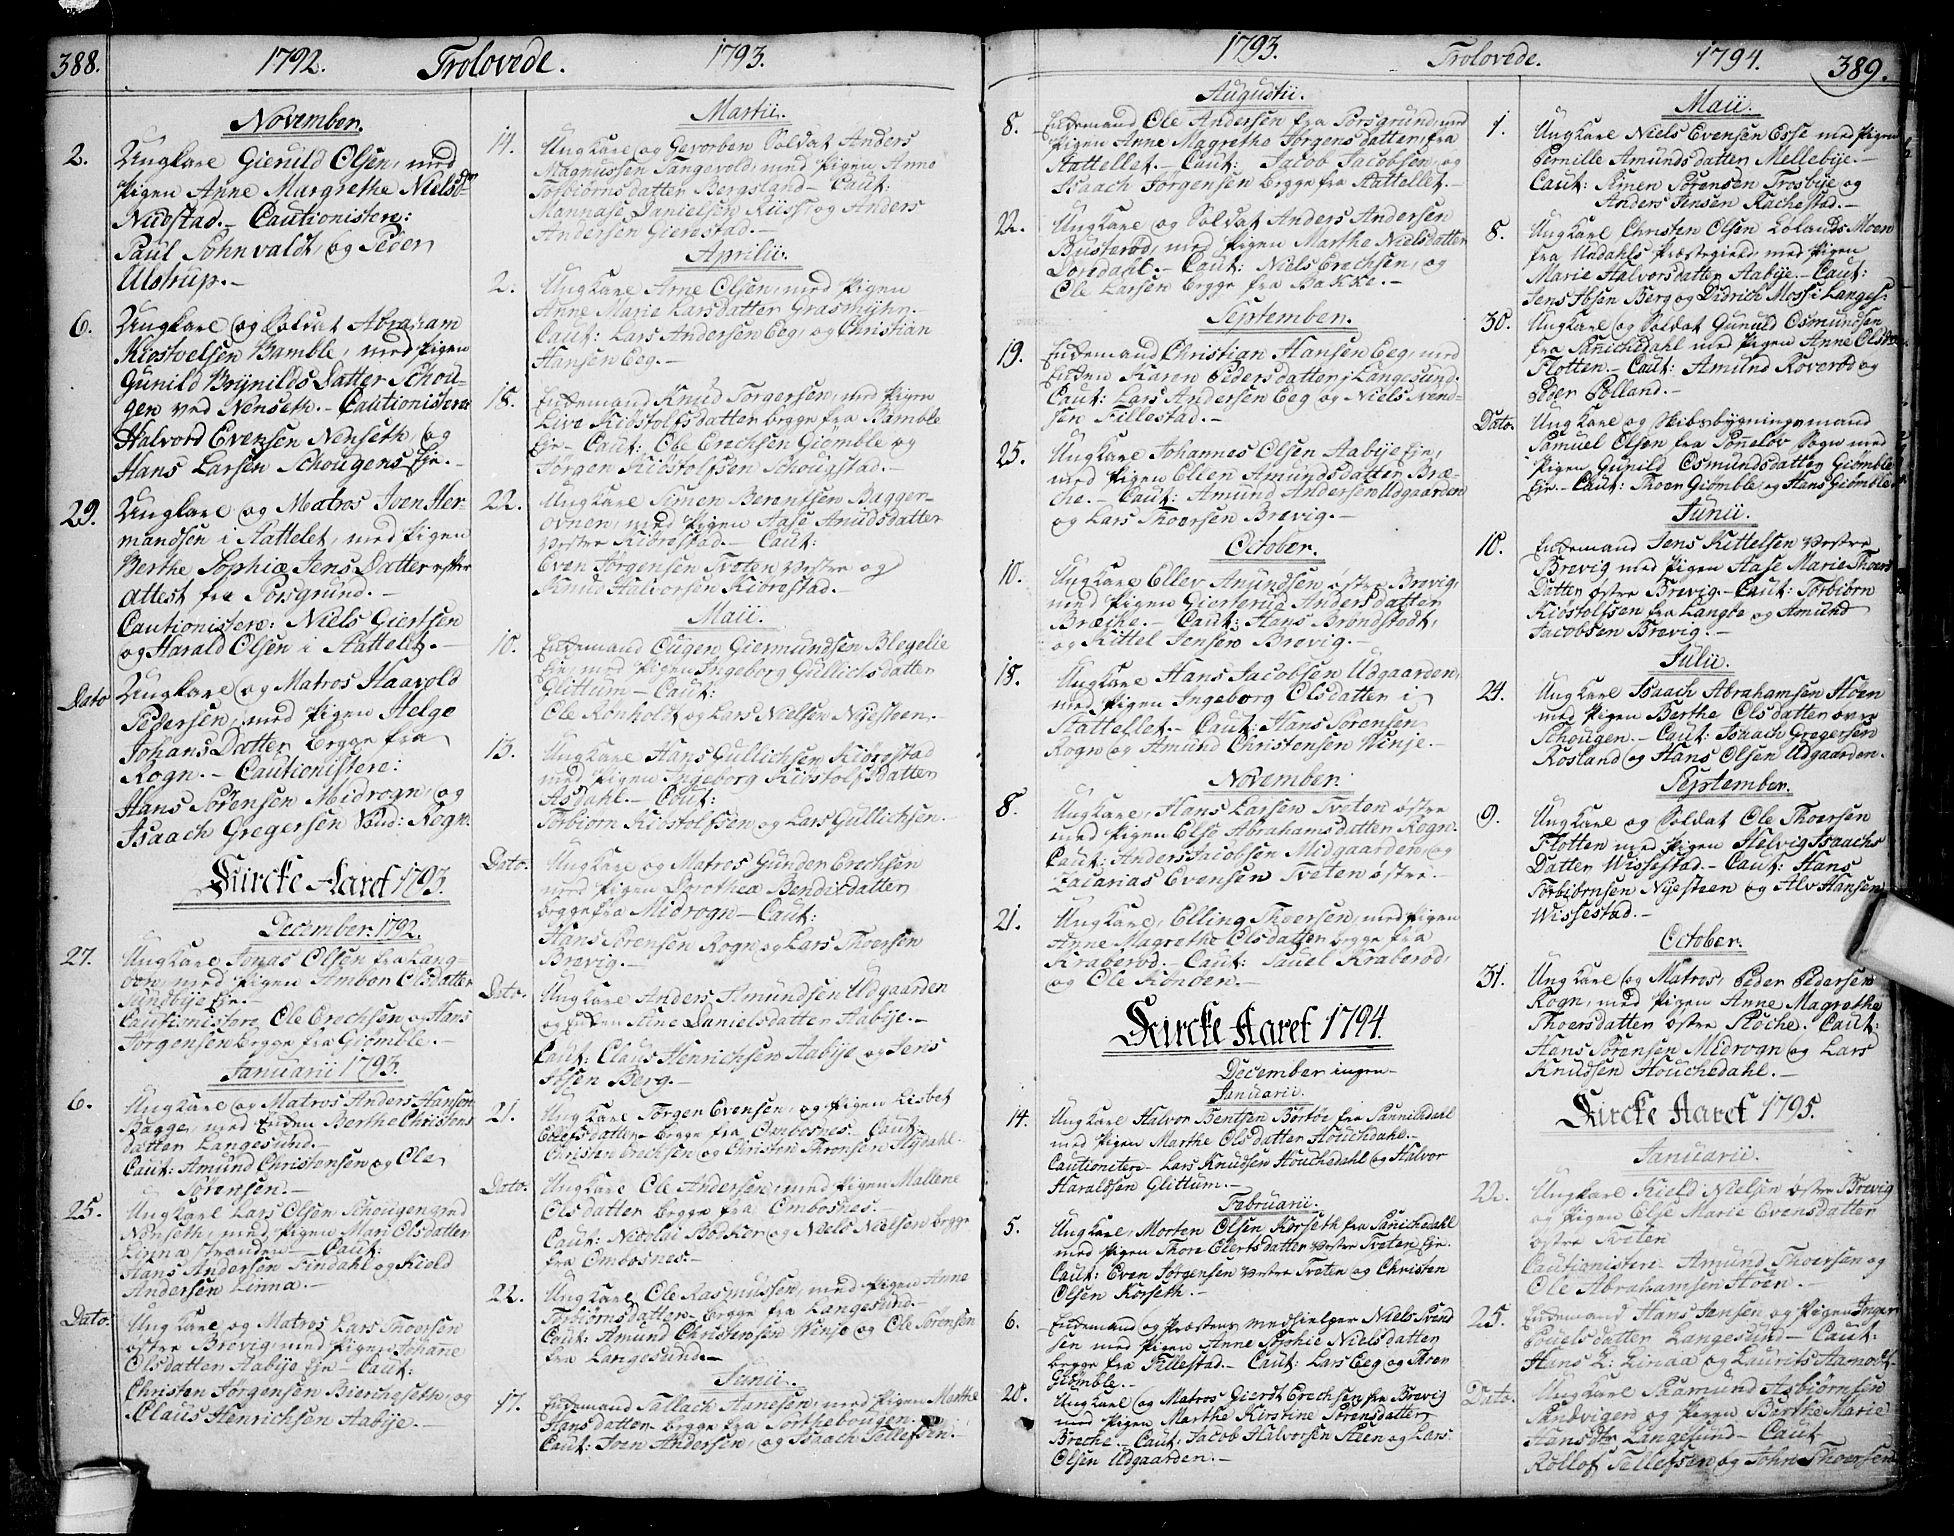 SAKO, Bamble kirkebøker, F/Fa/L0002: Ministerialbok nr. I 2, 1775-1814, s. 388-389